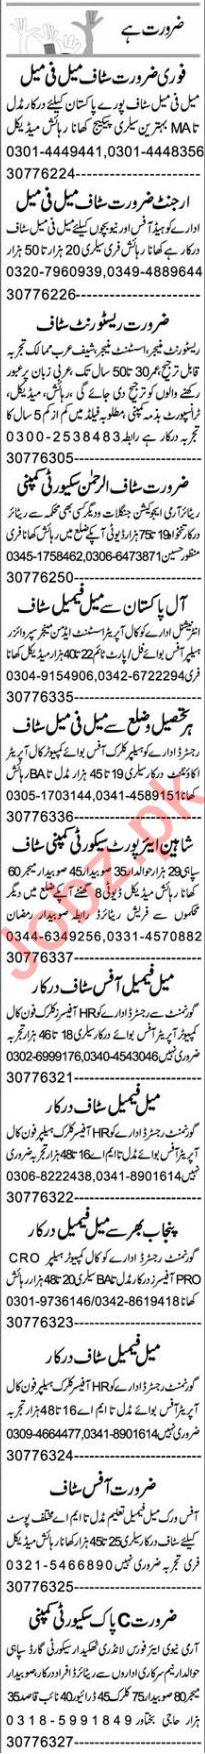 AutoCAD Operator & Web Developer Jobs 2021 in Multan